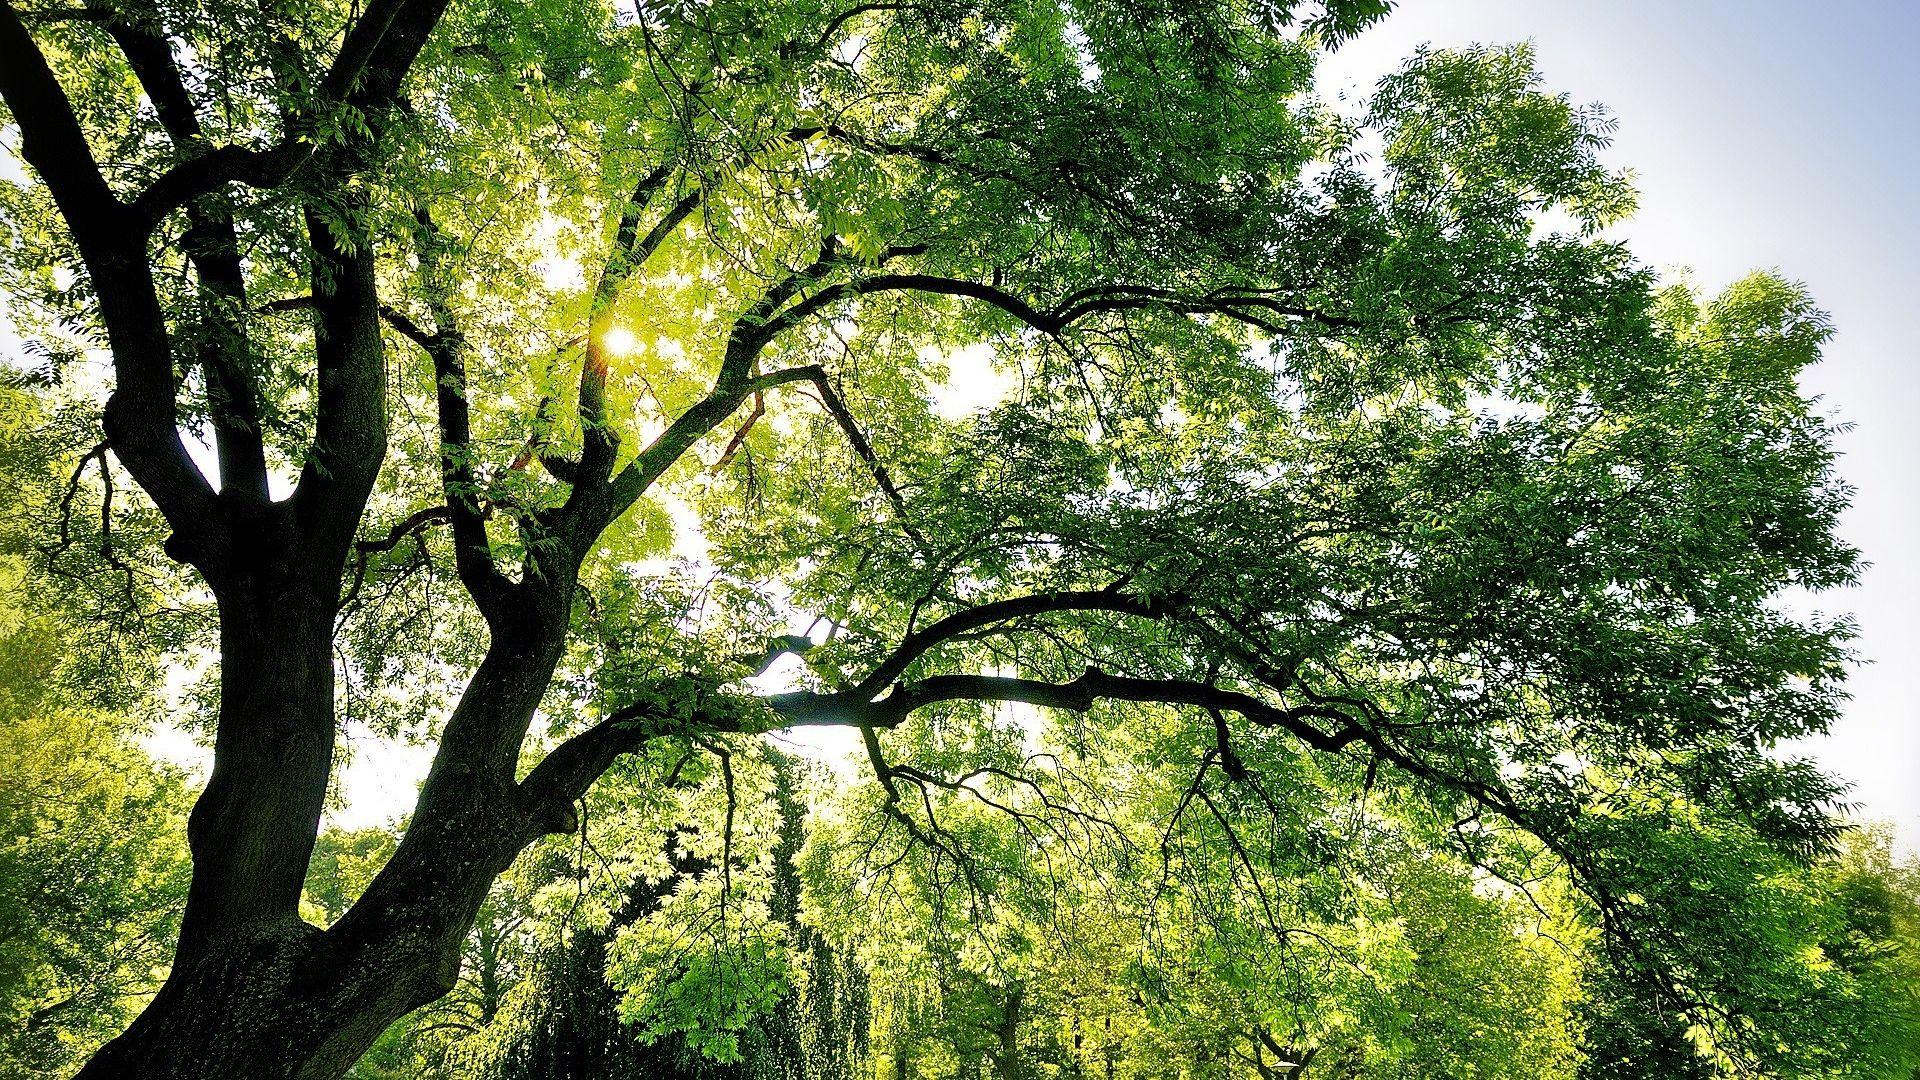 Tree Branch wallpaper photo